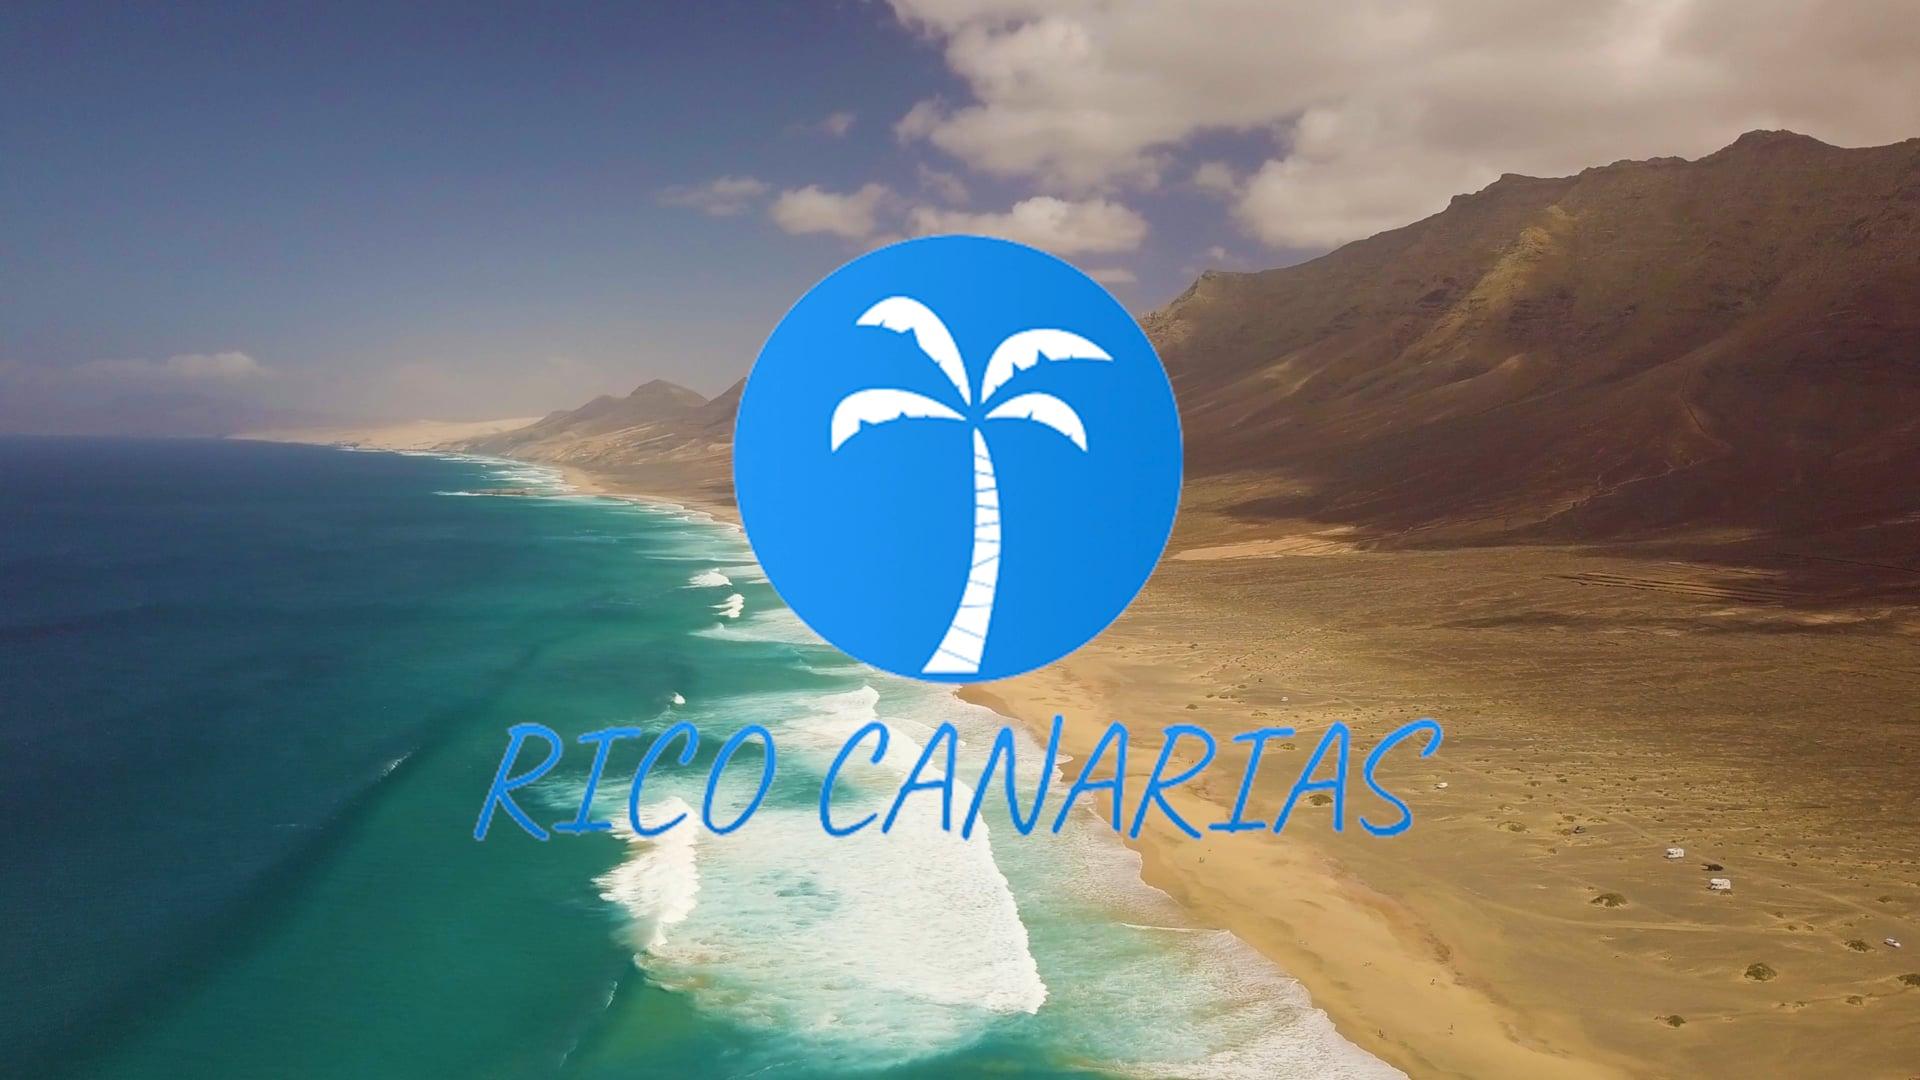 Rico Canarias